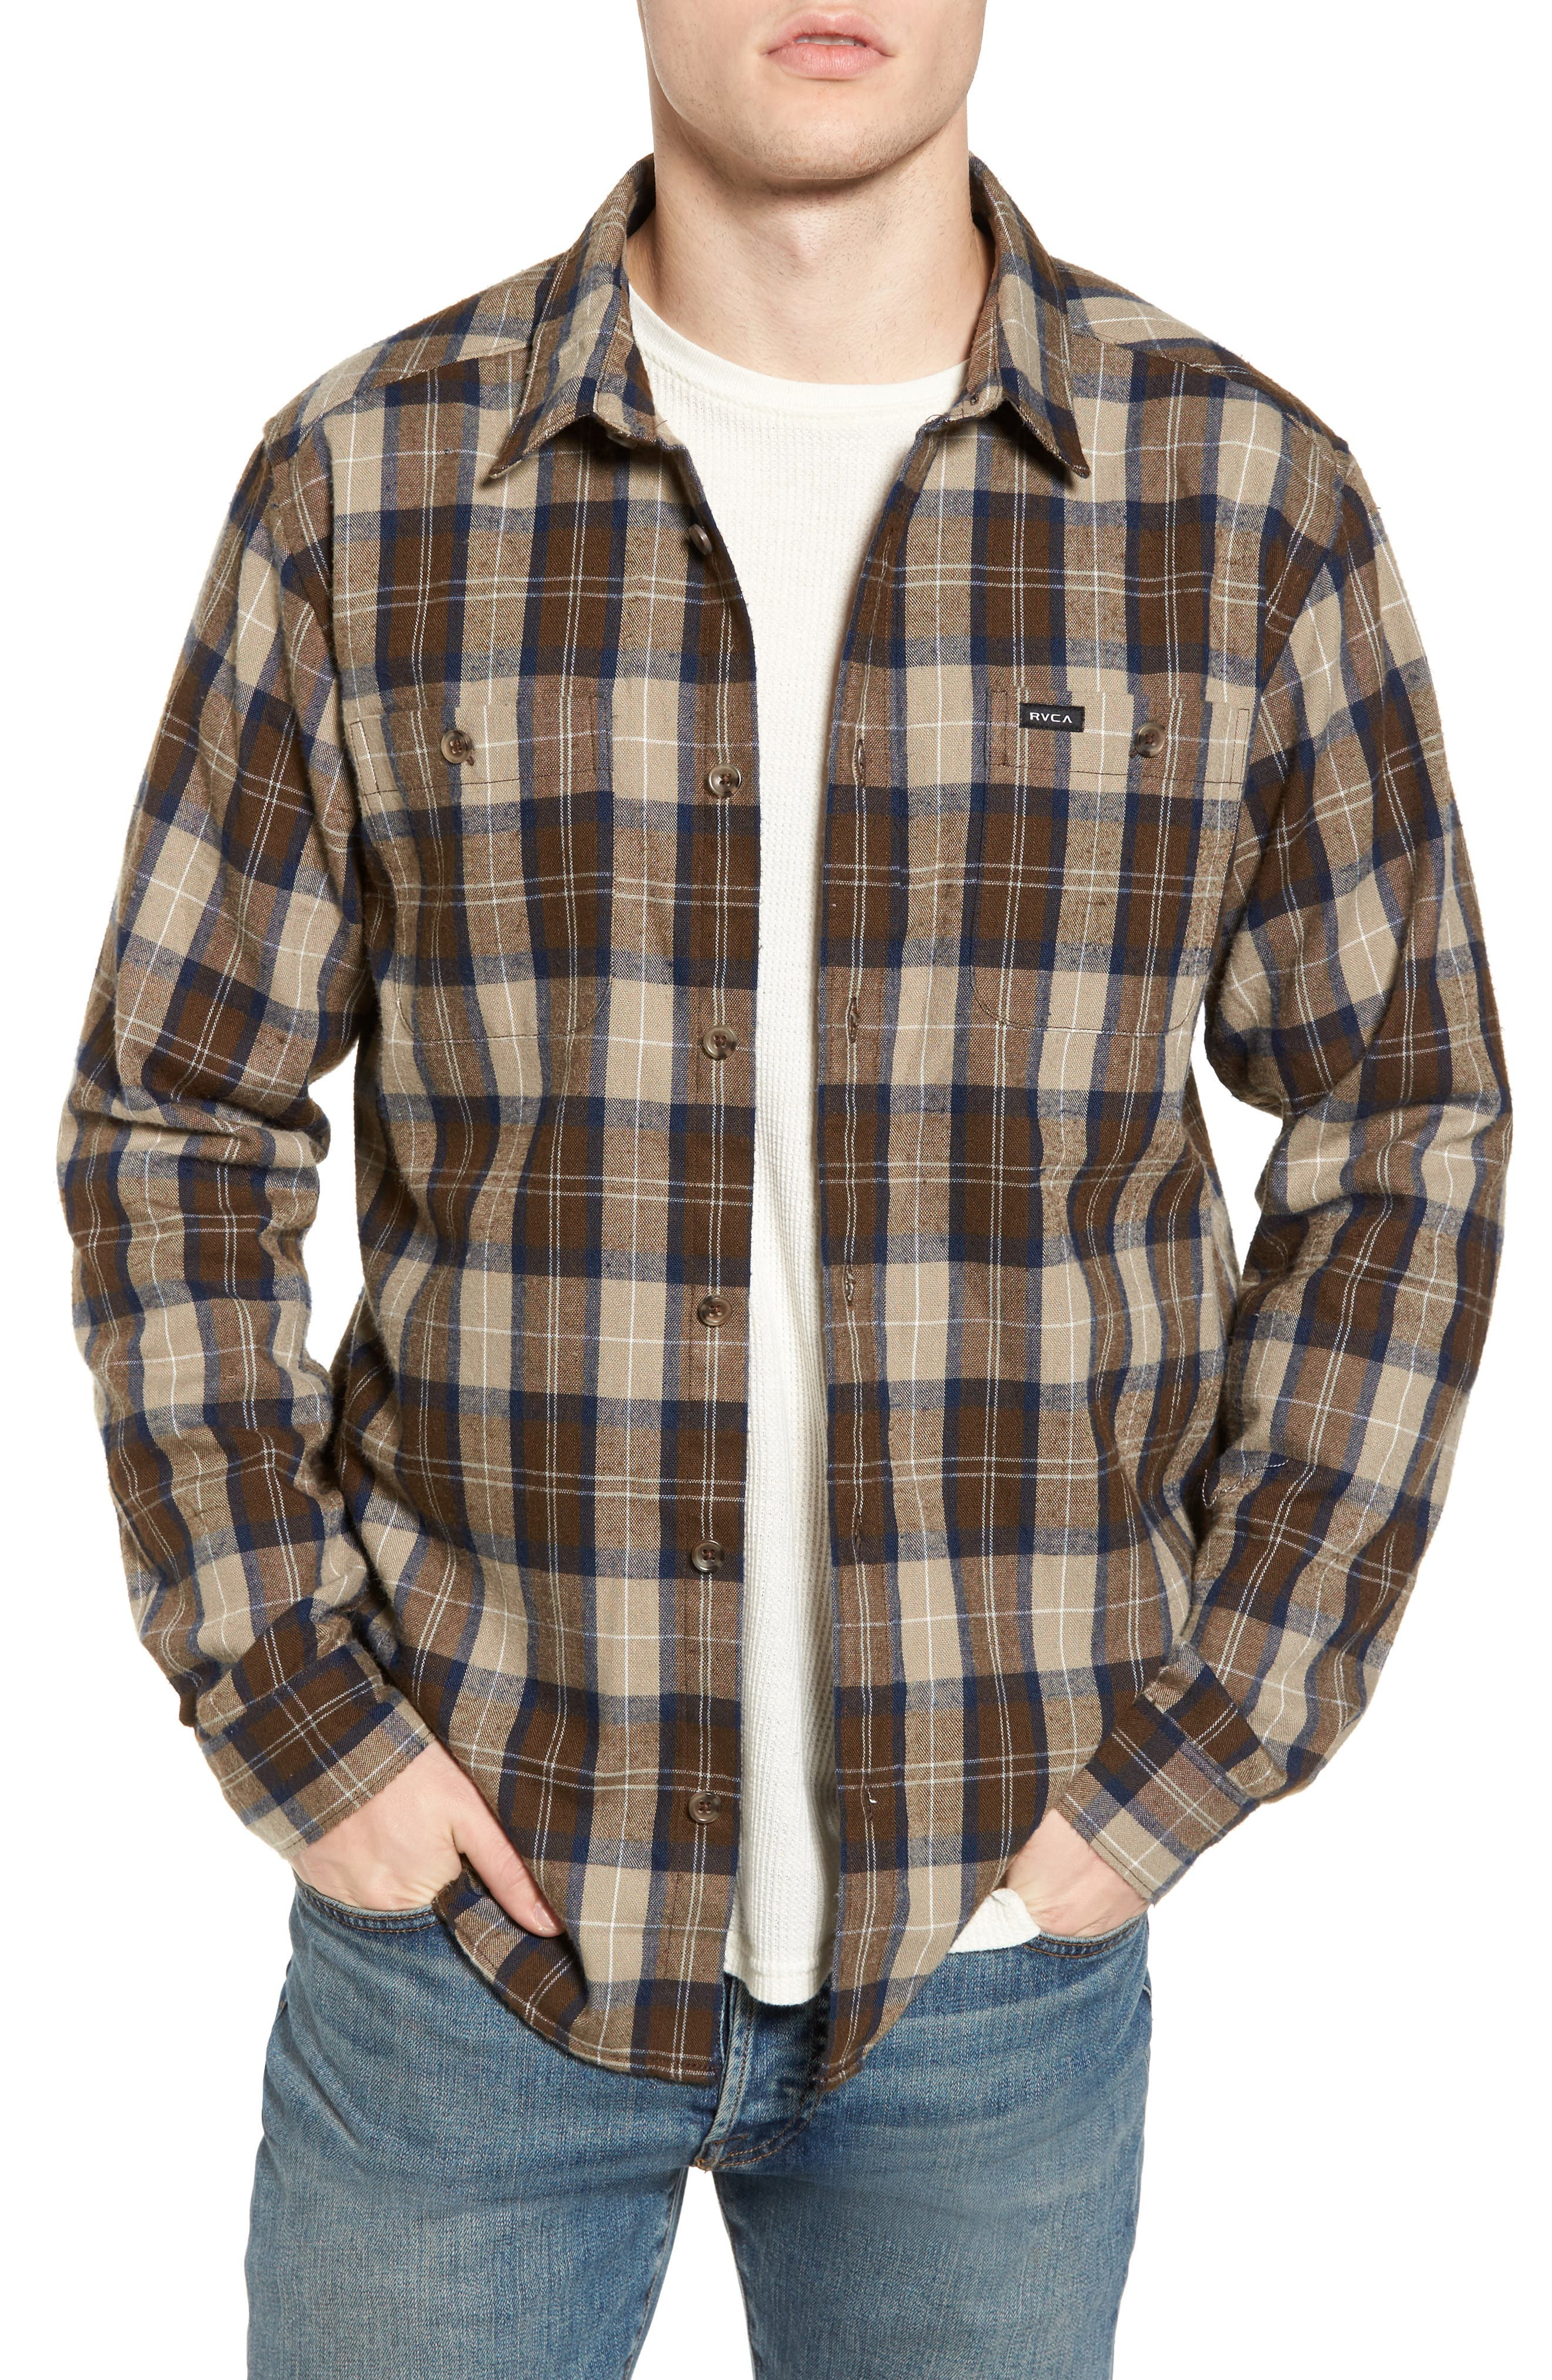 Bone Flannel Shirt,                             Main thumbnail 1, color,                             250